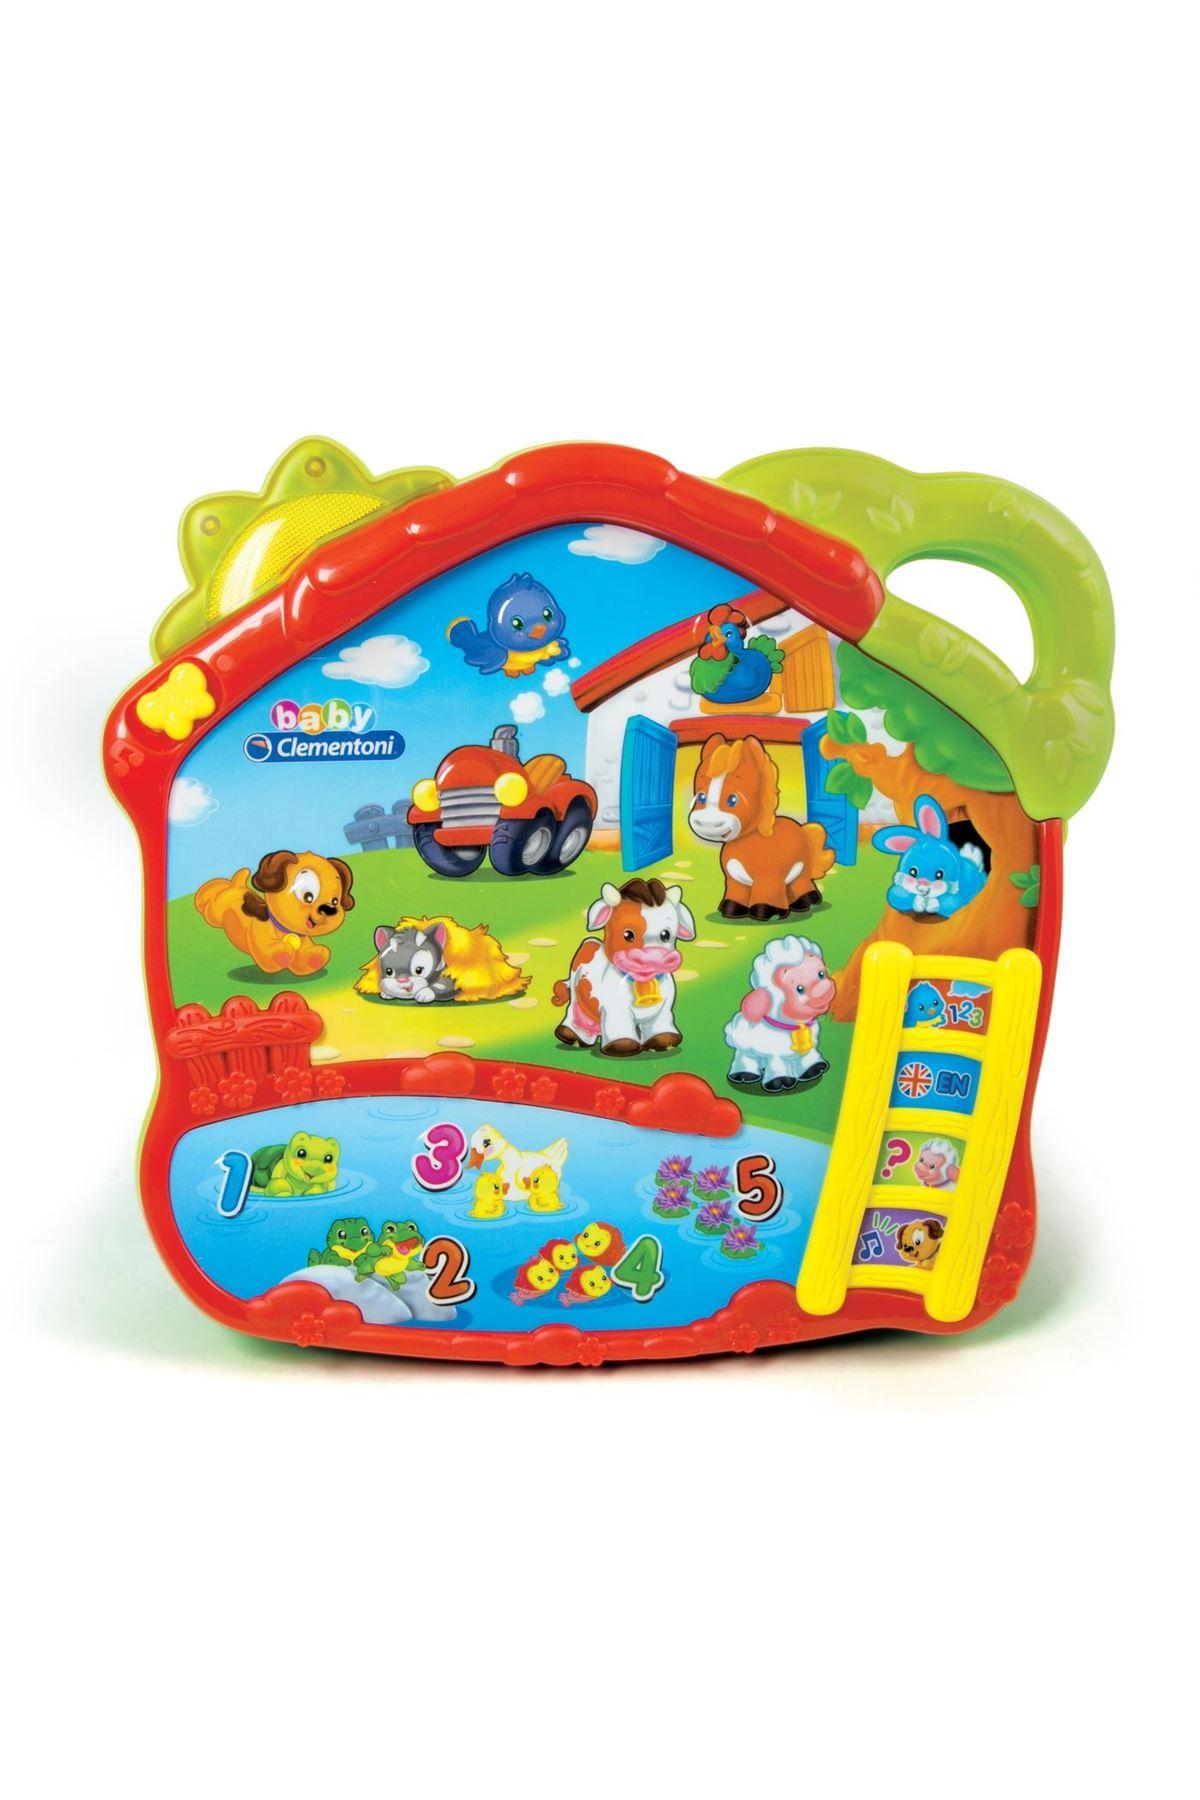 Clementoni Baby Çiftlik Korosu 64941